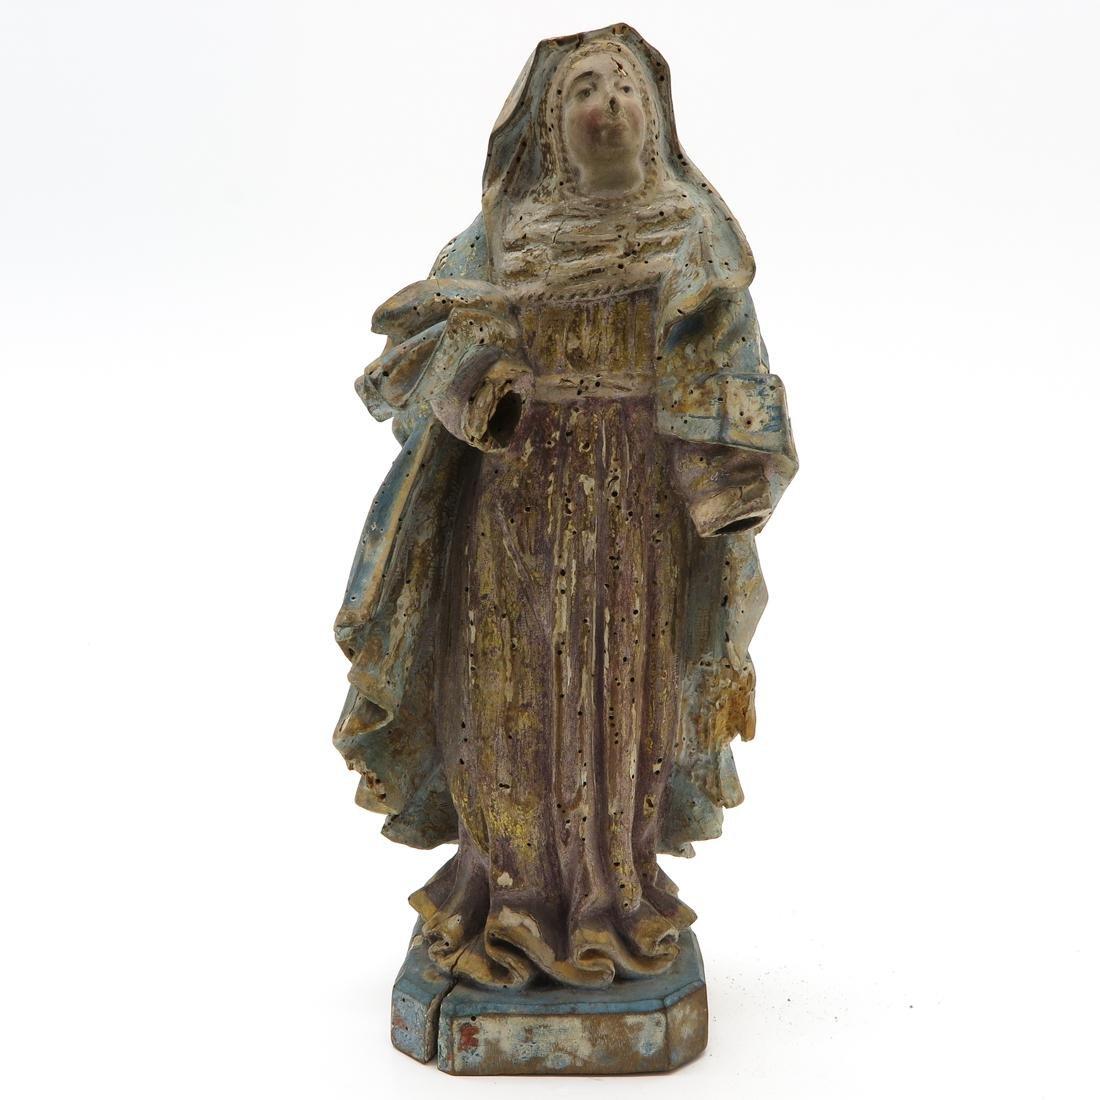 Carved Polychrome Wood Statue of Saint Circa 1800